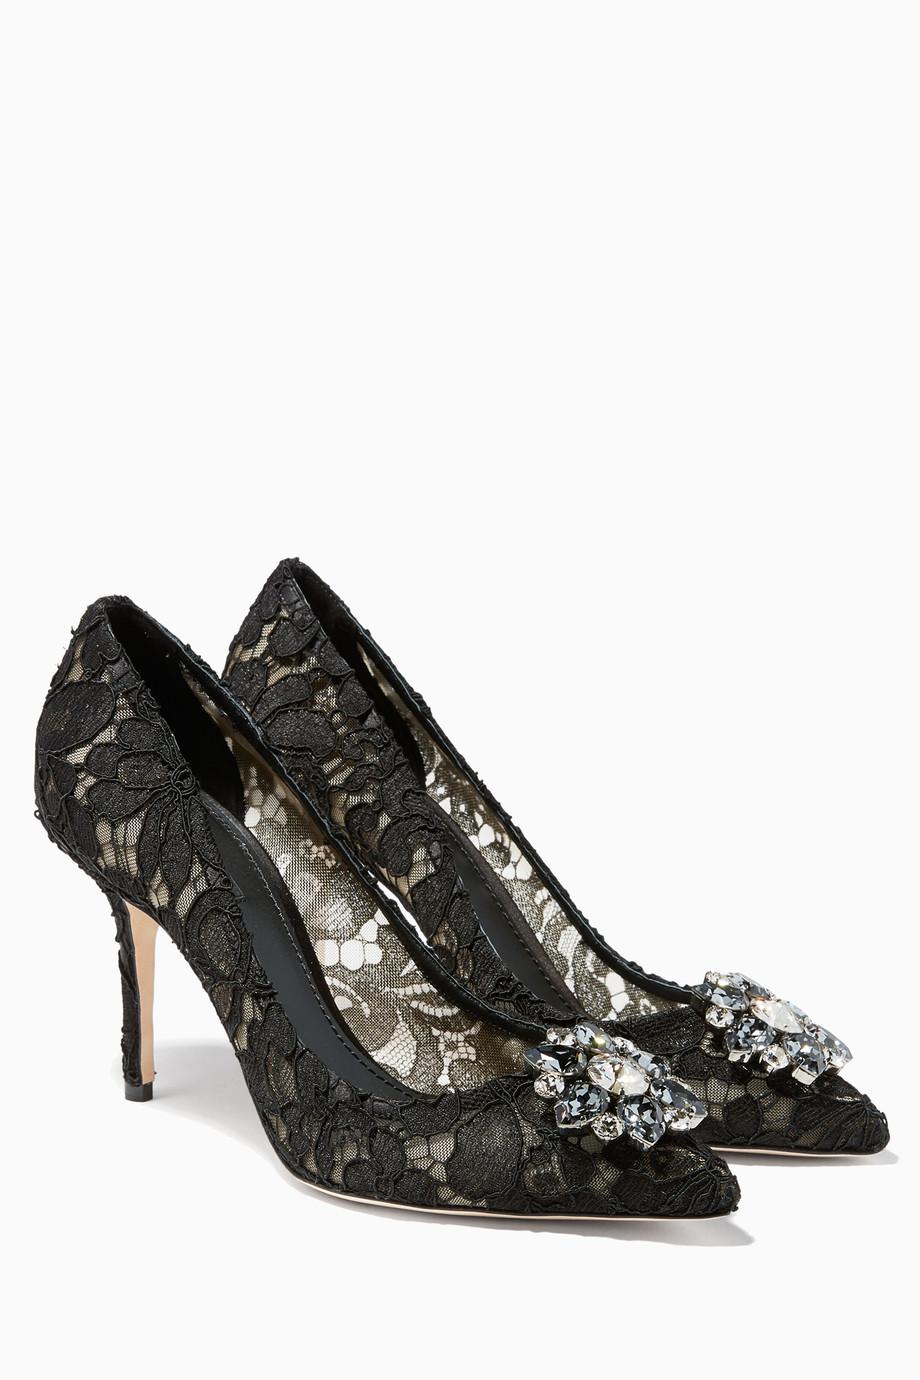 f1fdca70f8 Black Bellucci Lace Pumps Black Bellucci Lace Pumps Black Bellucci Lace  Pumps Black Bellucci Lace Pumps. Dolce & Gabbana